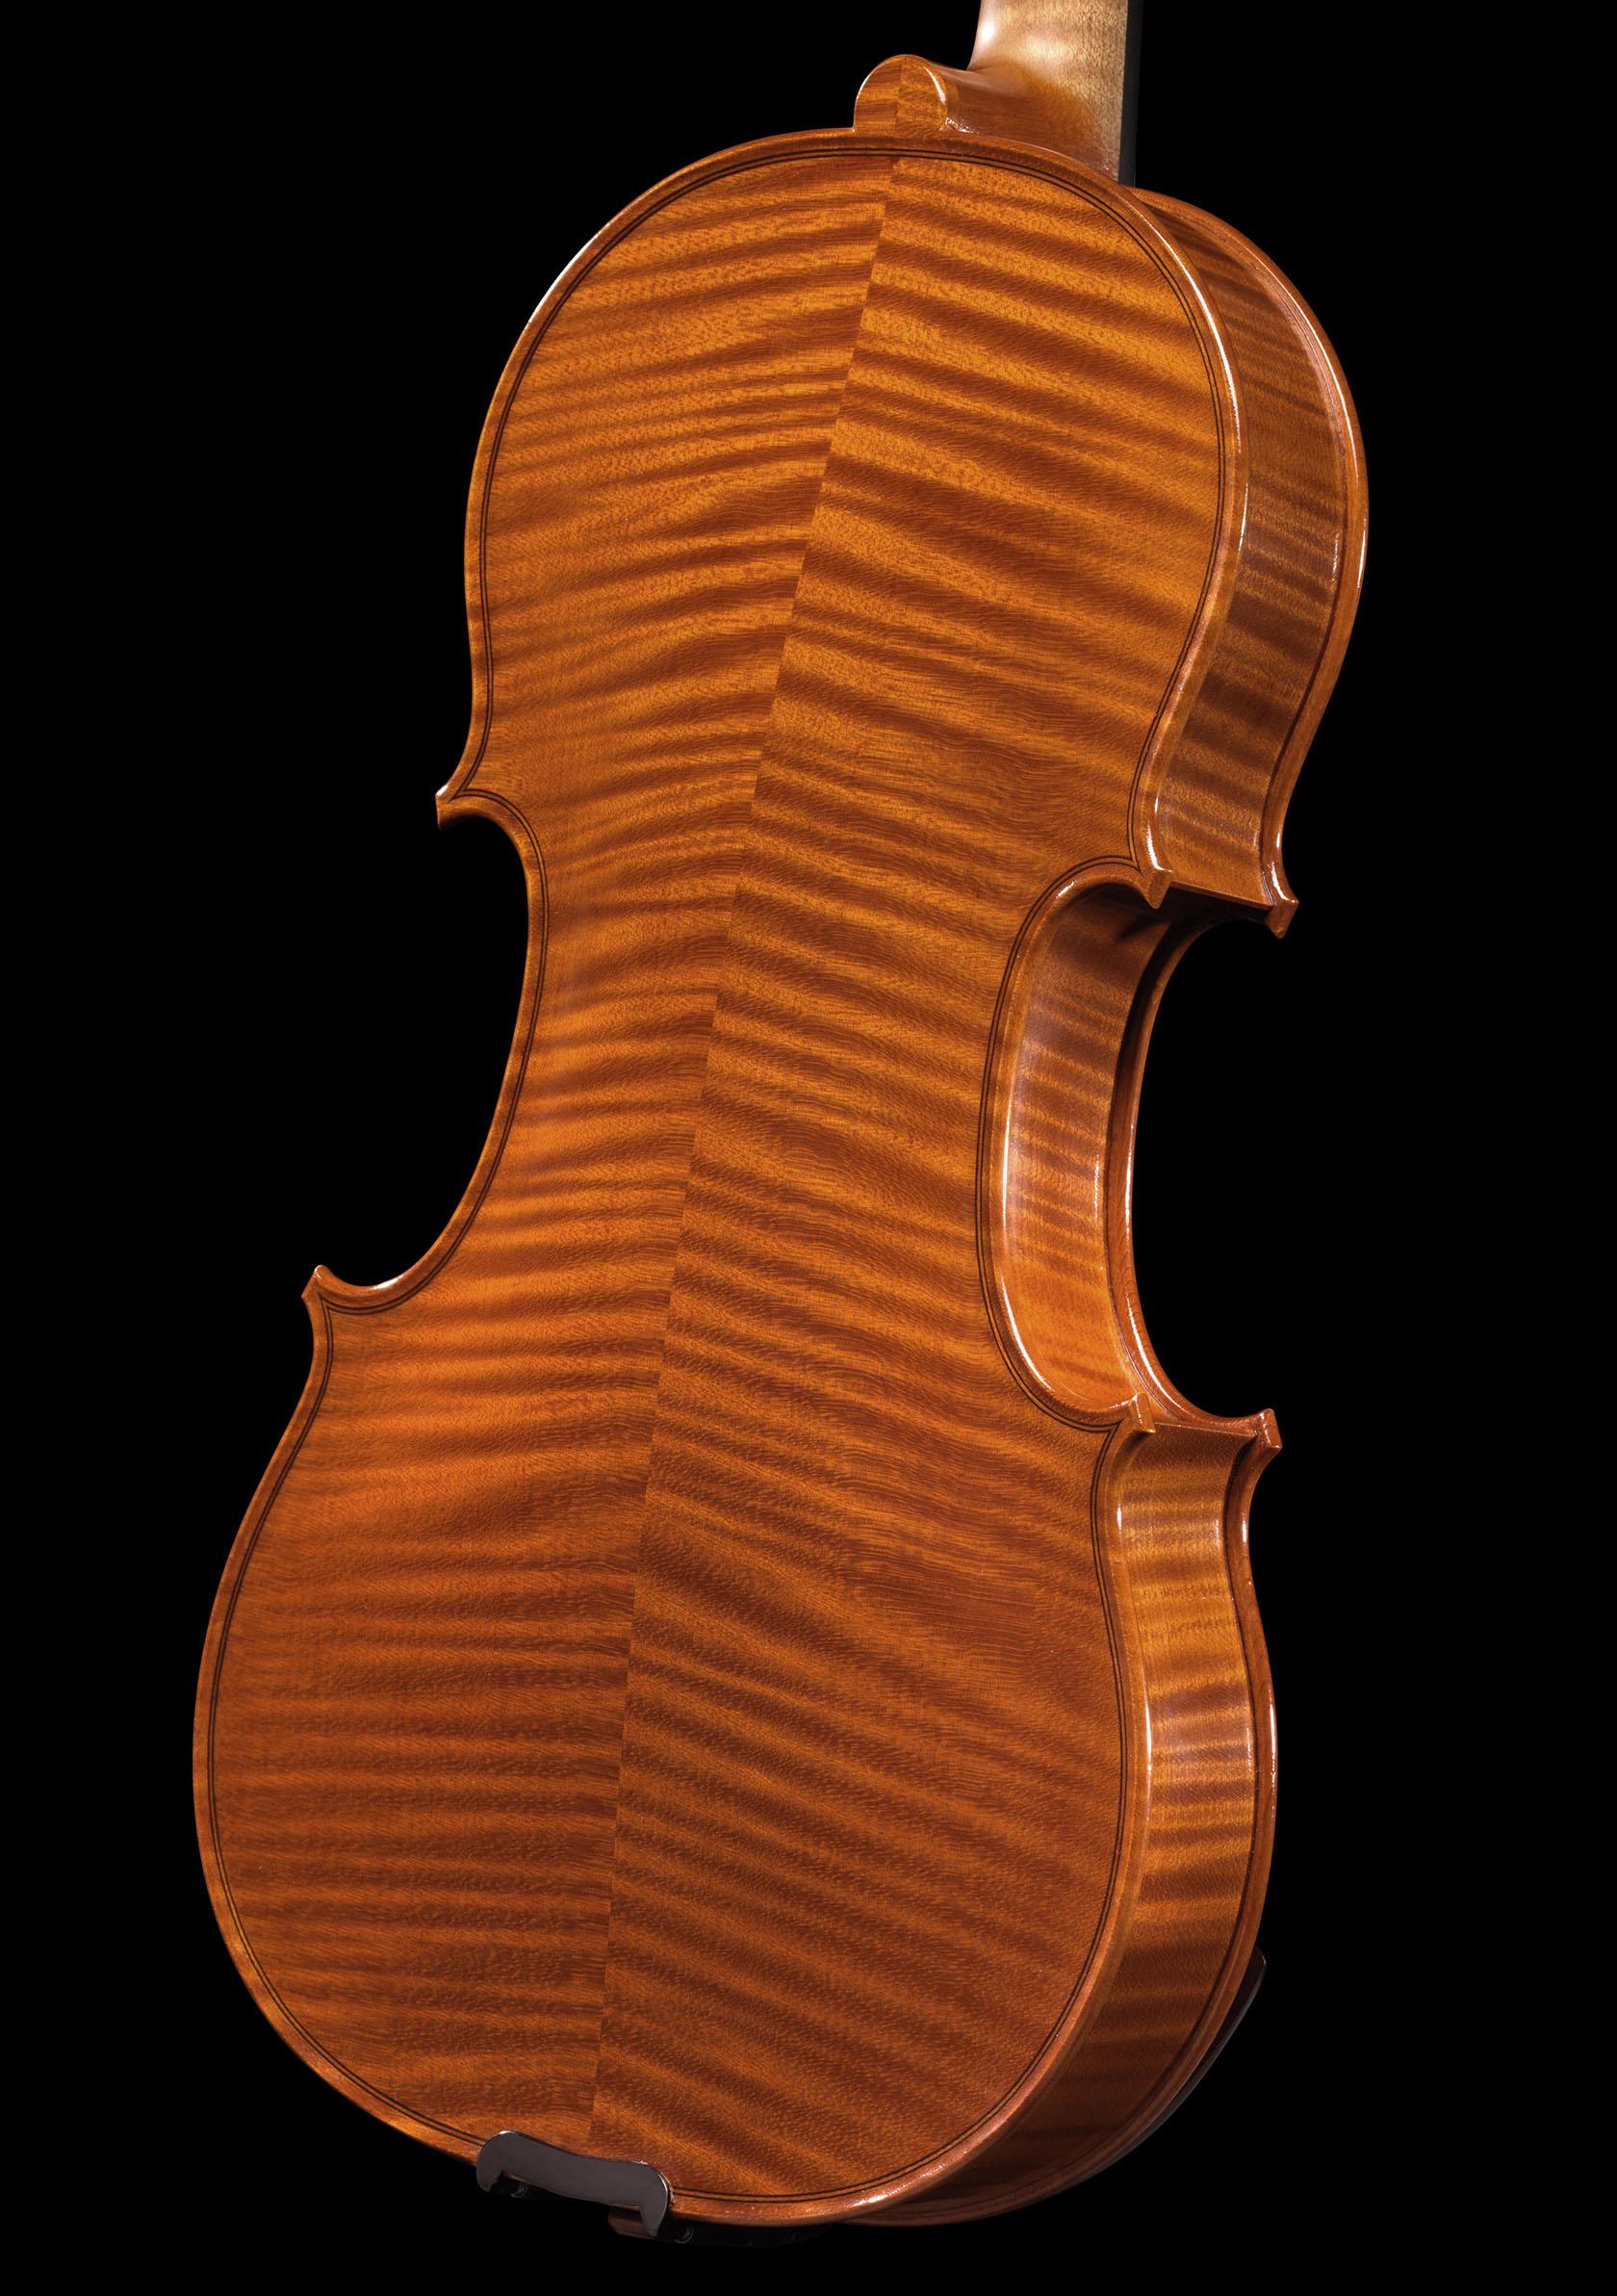 R. VALENCIA